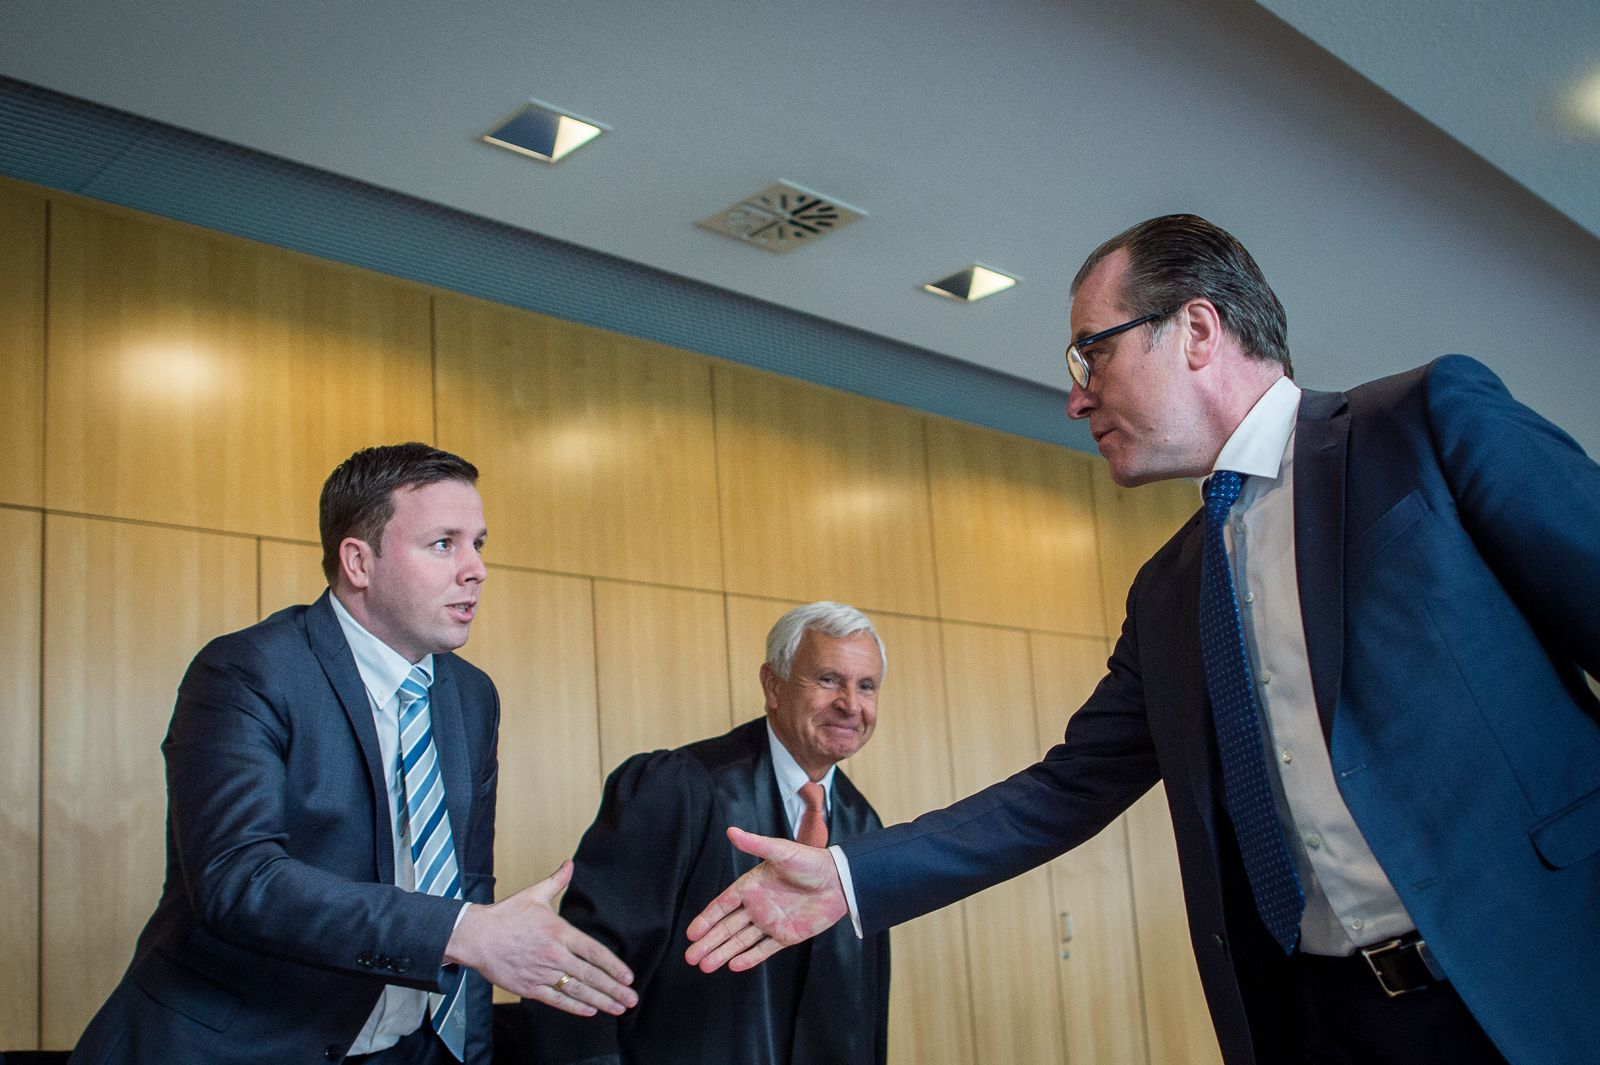 Tönnies-Prozess / Clemens Tönnies & Robert Tönnies